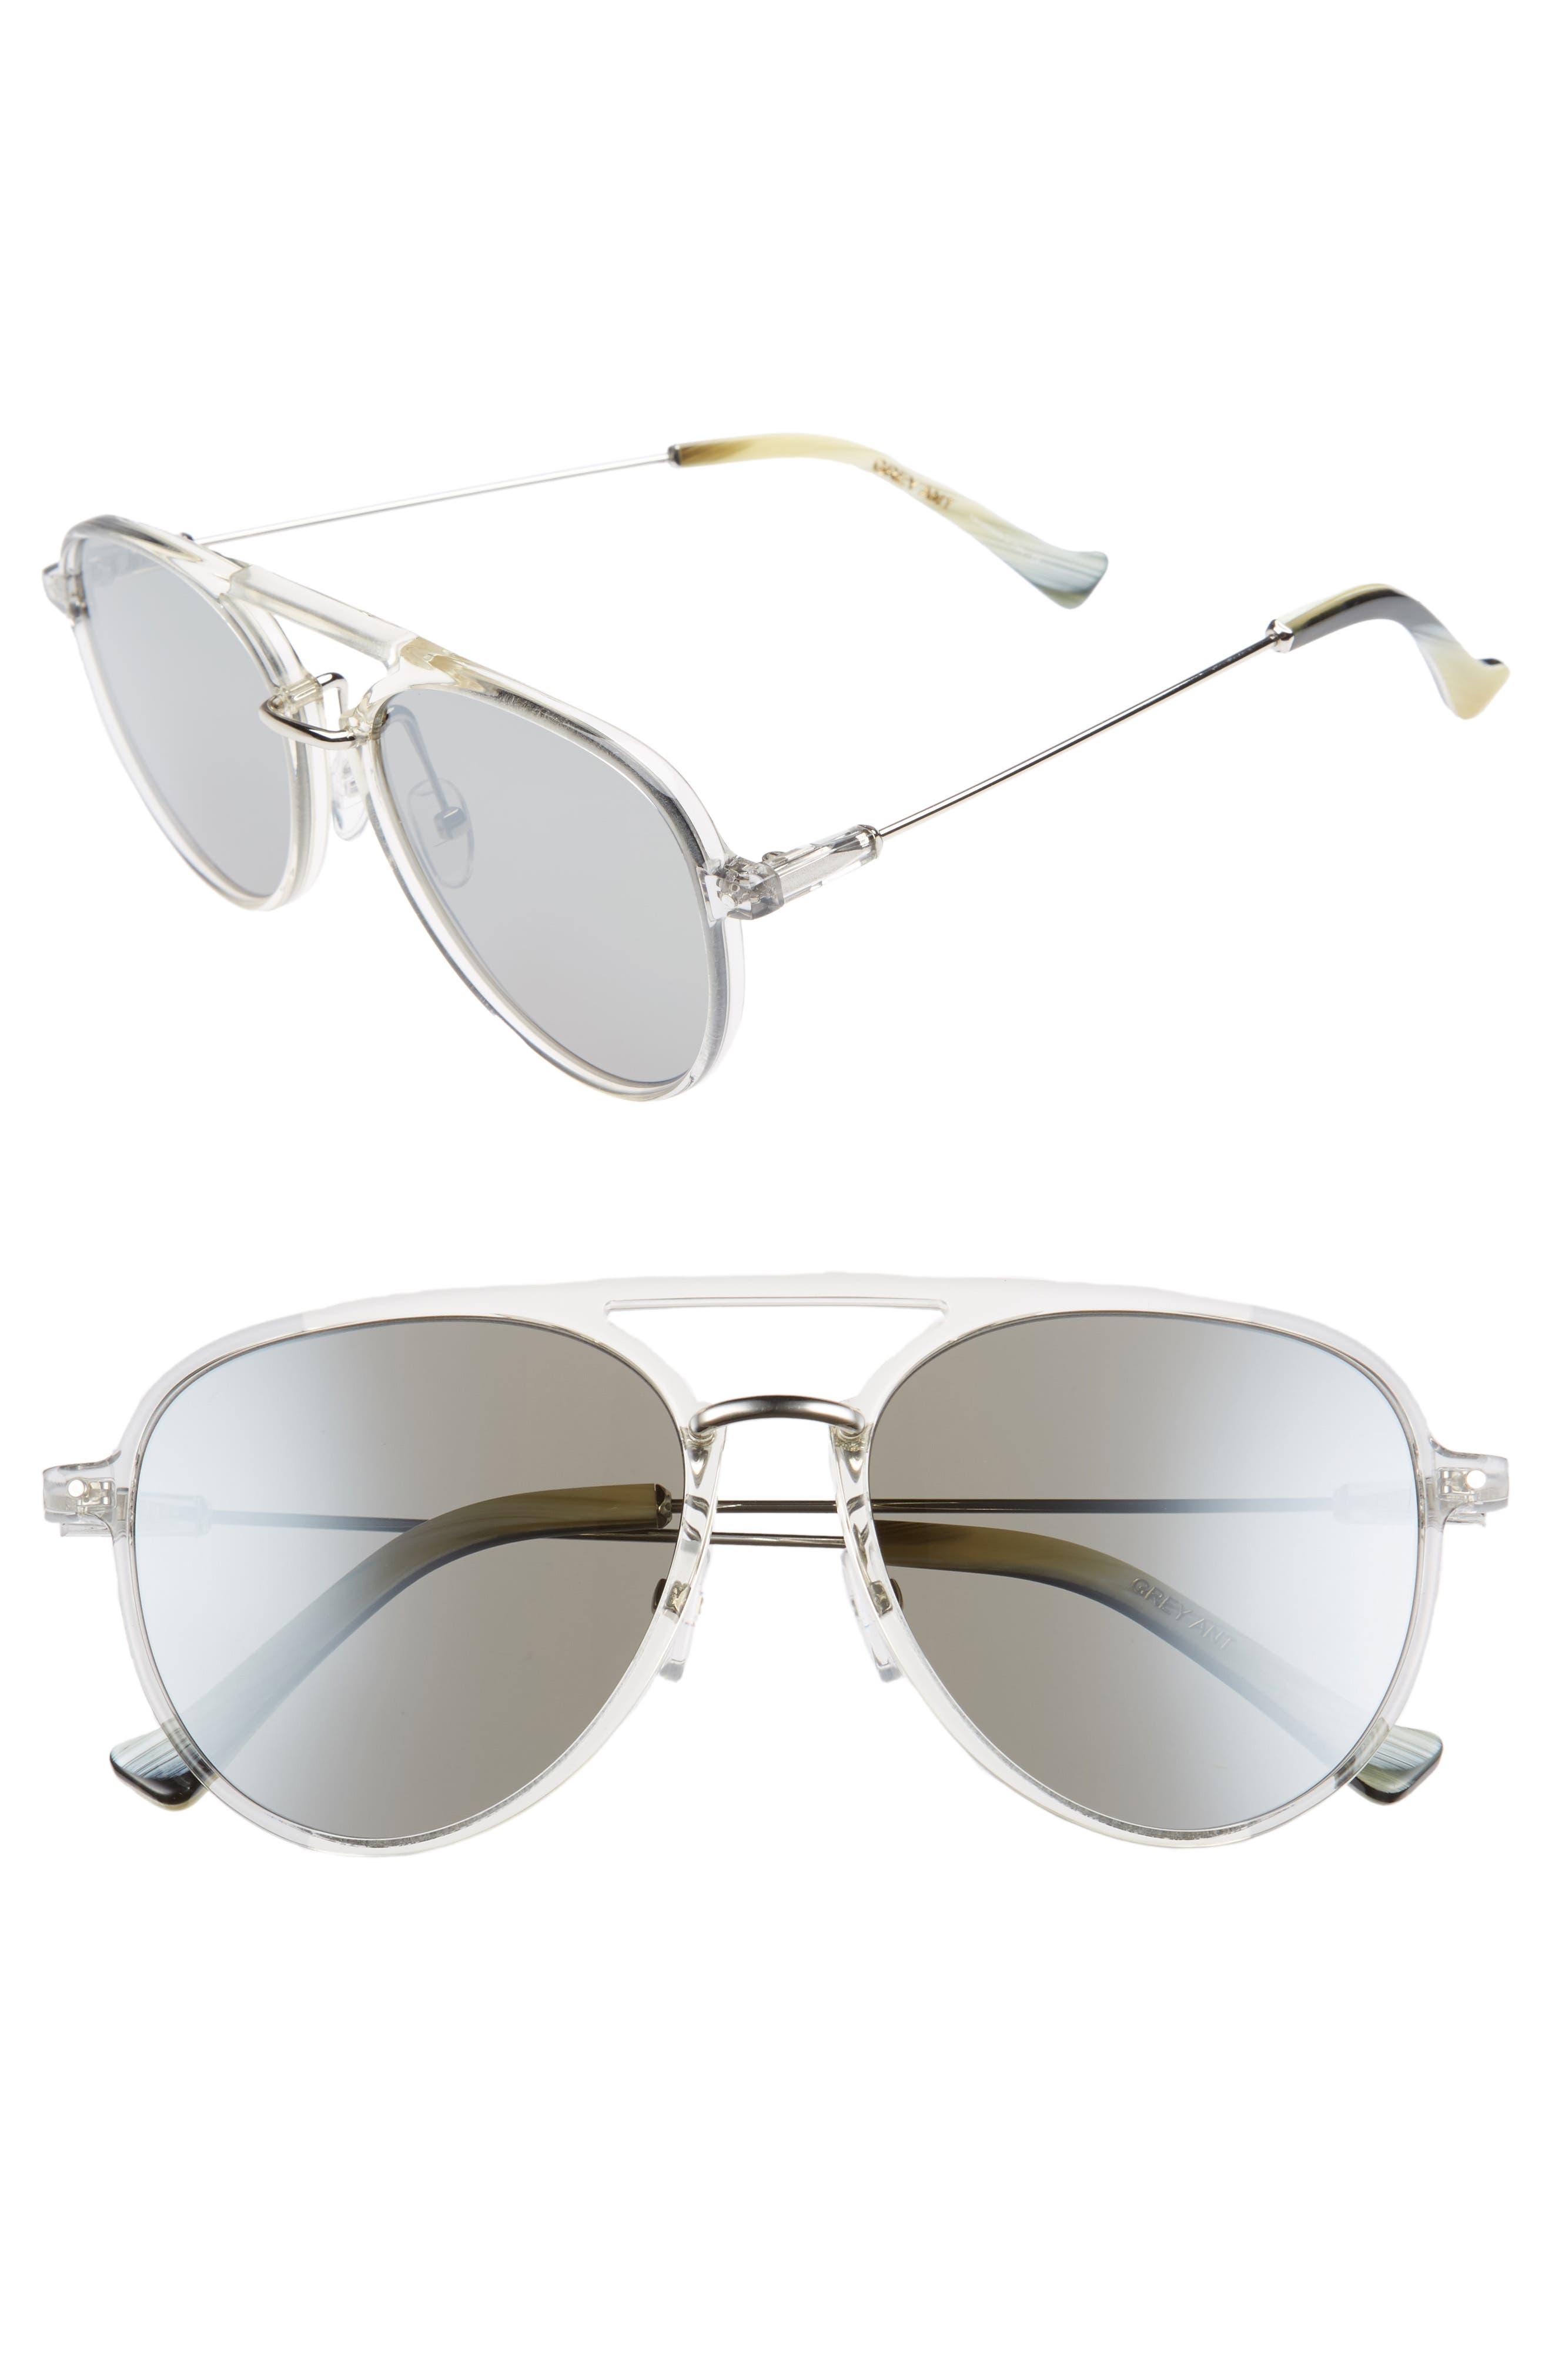 Praph 57mm Sunglasses,                         Main,                         color, SILVER LENS/ CLEAR HARDWARE